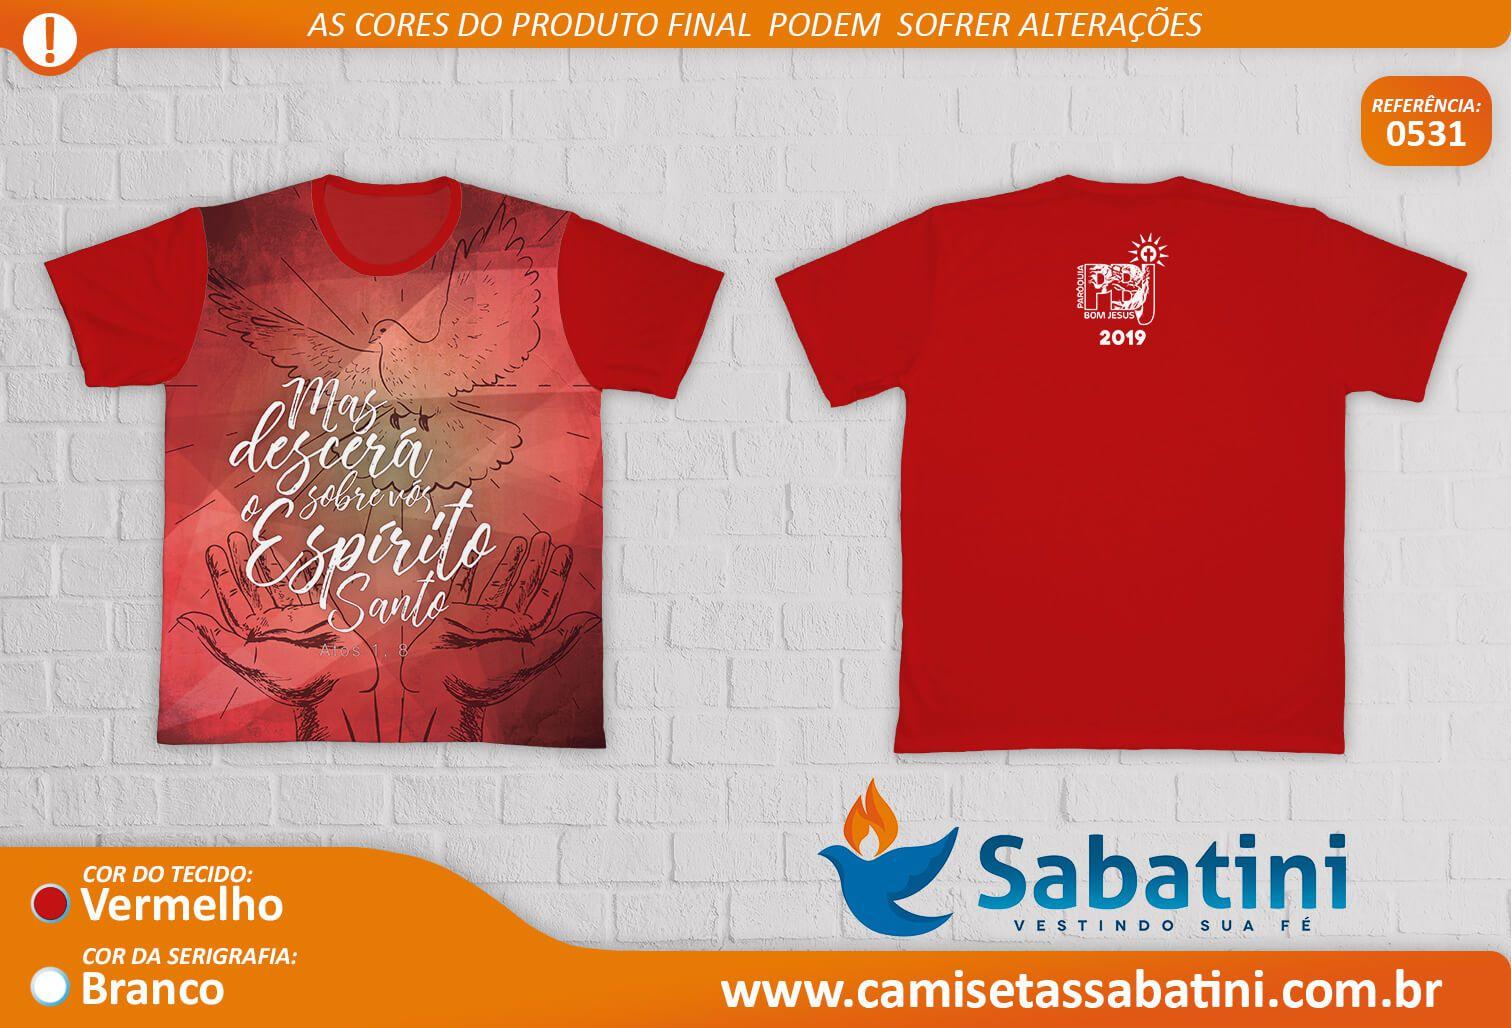 Camiseta Personalizada - CRISMA - DOURADOS - MS - ID:14749109  - Camisetas Sabatini